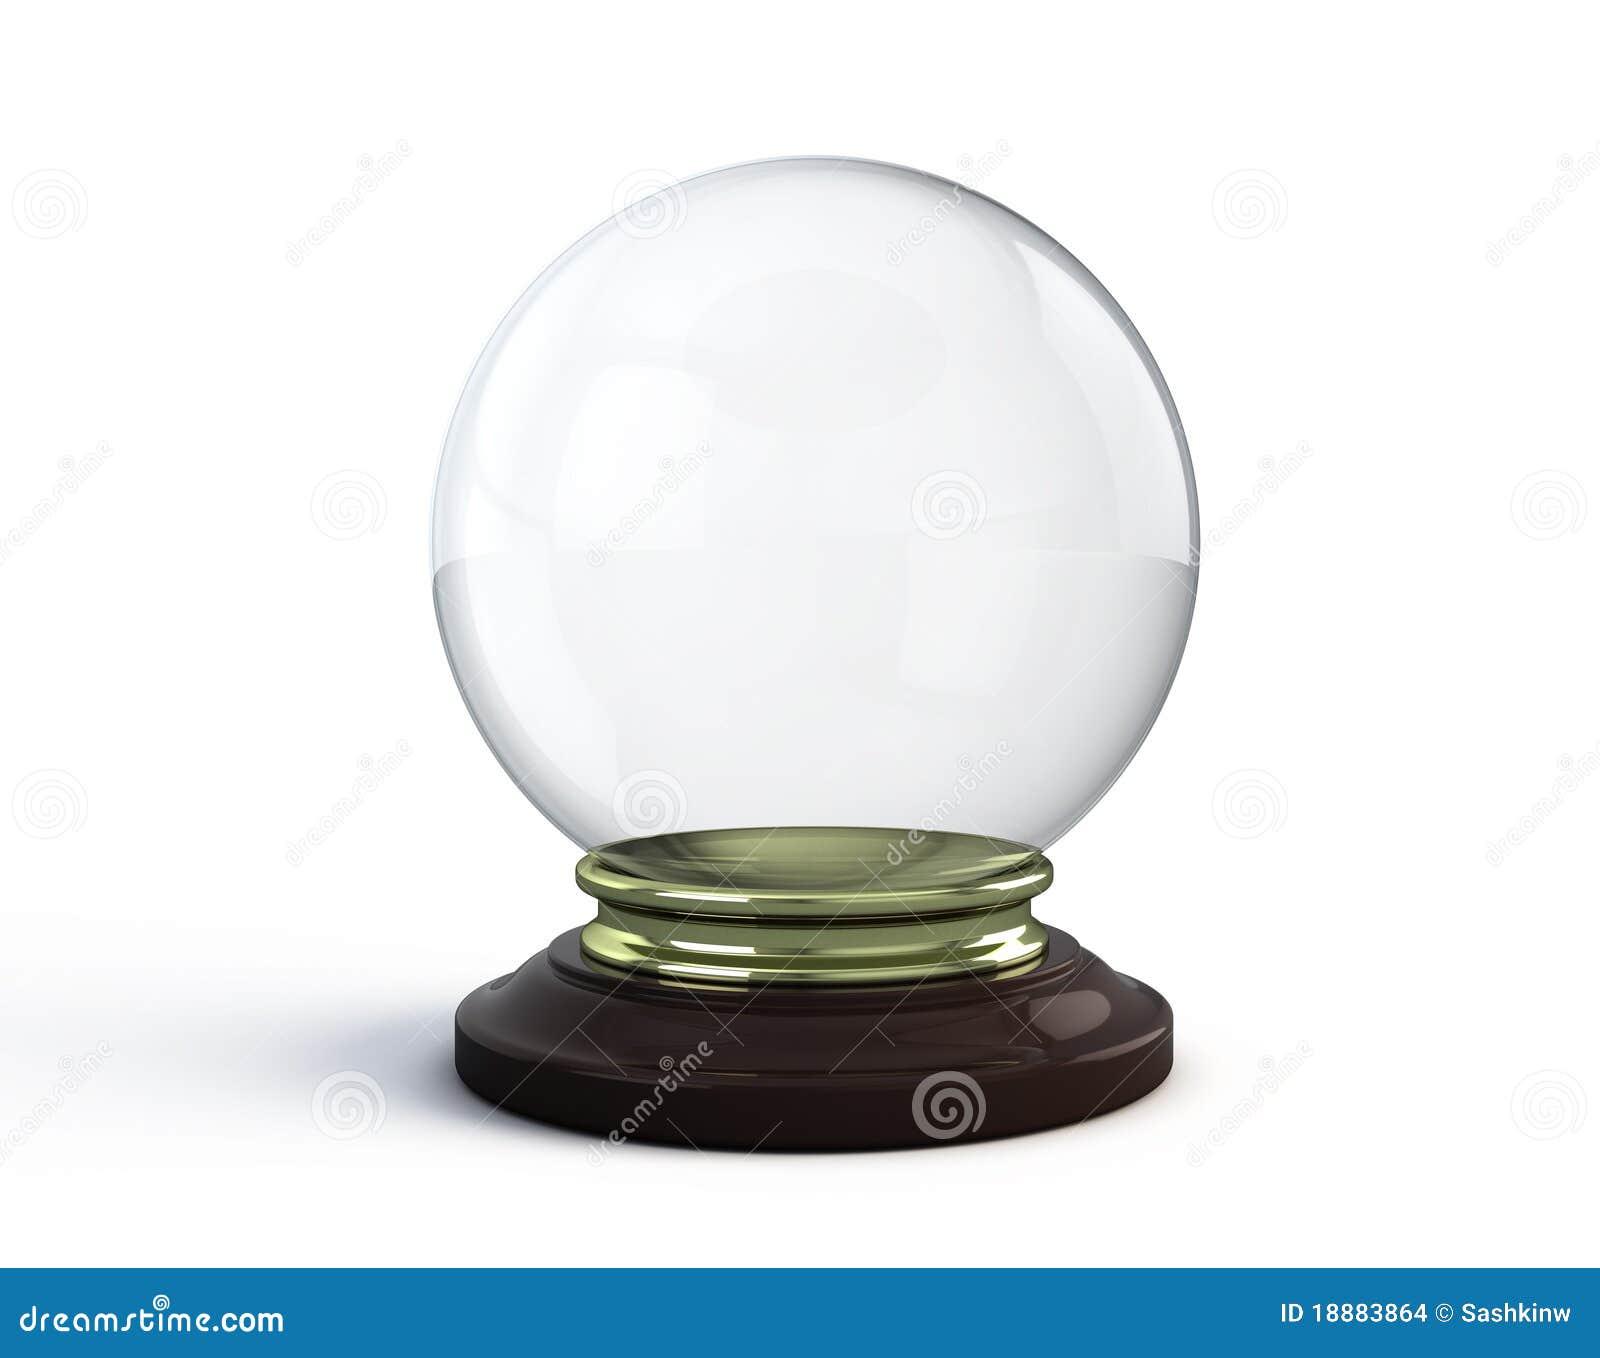 Magic Ball Stock Images - Image: 18883864